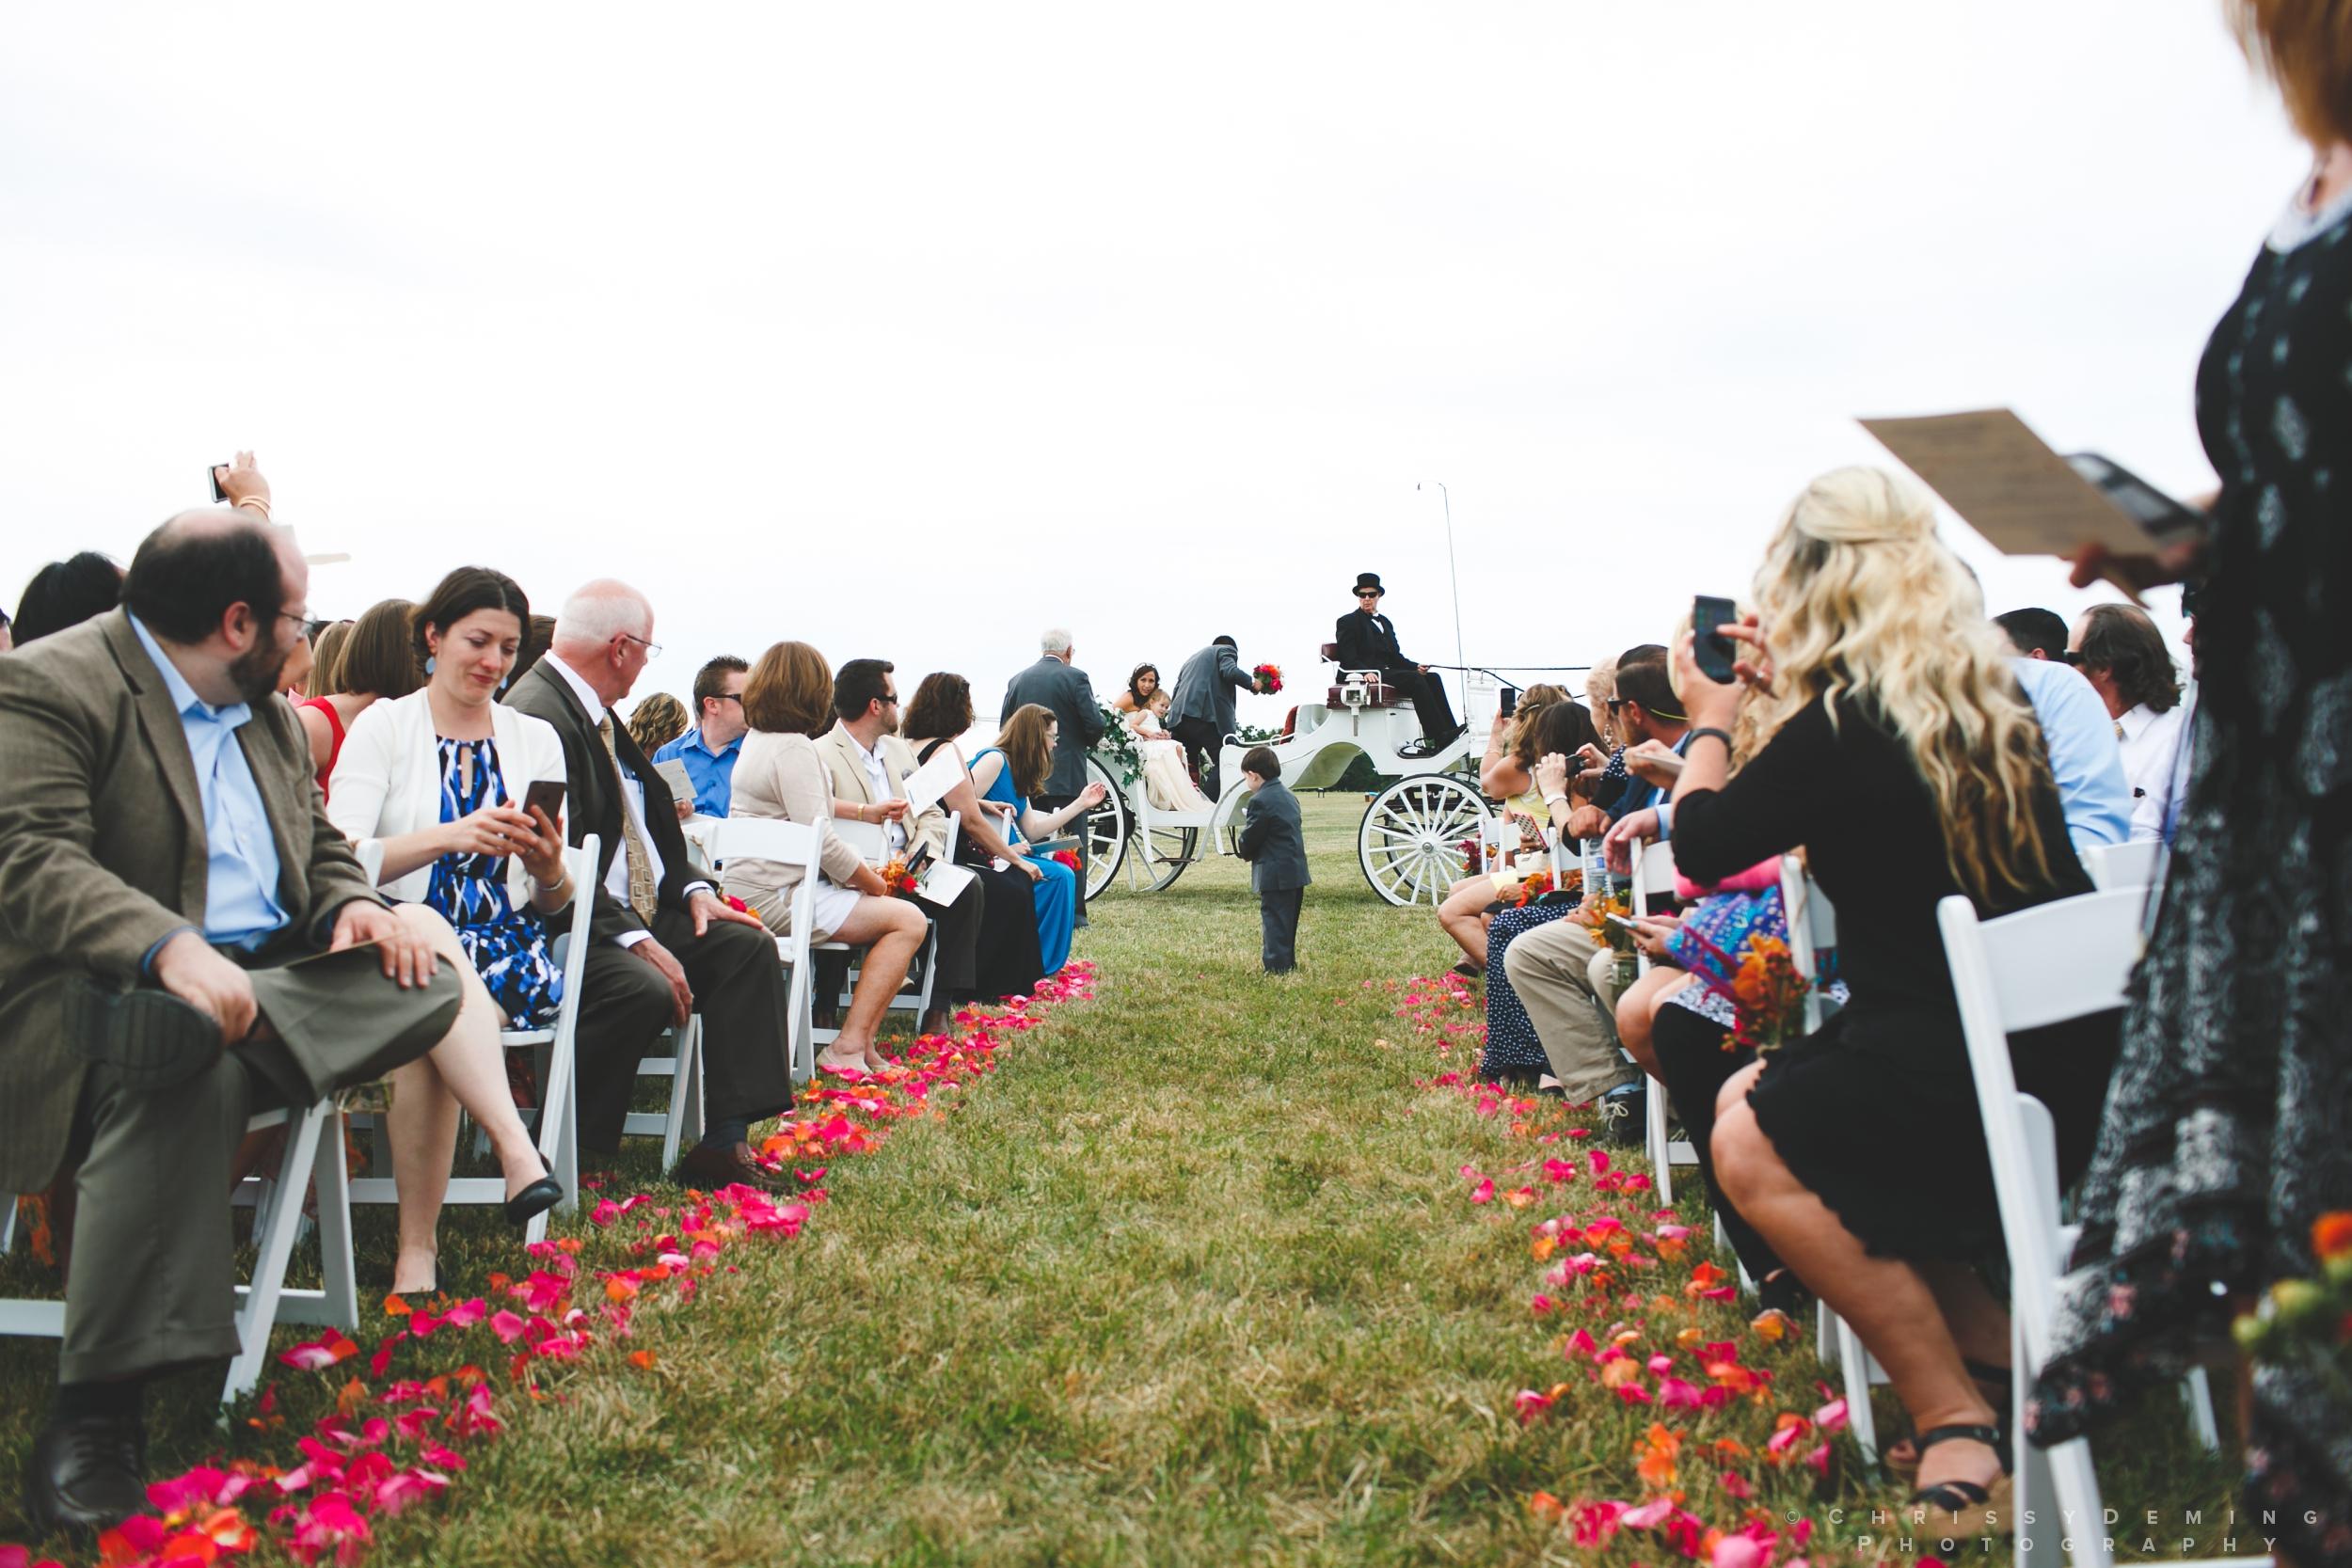 crete_IL_farm_wedding_photographer_0020.jpg